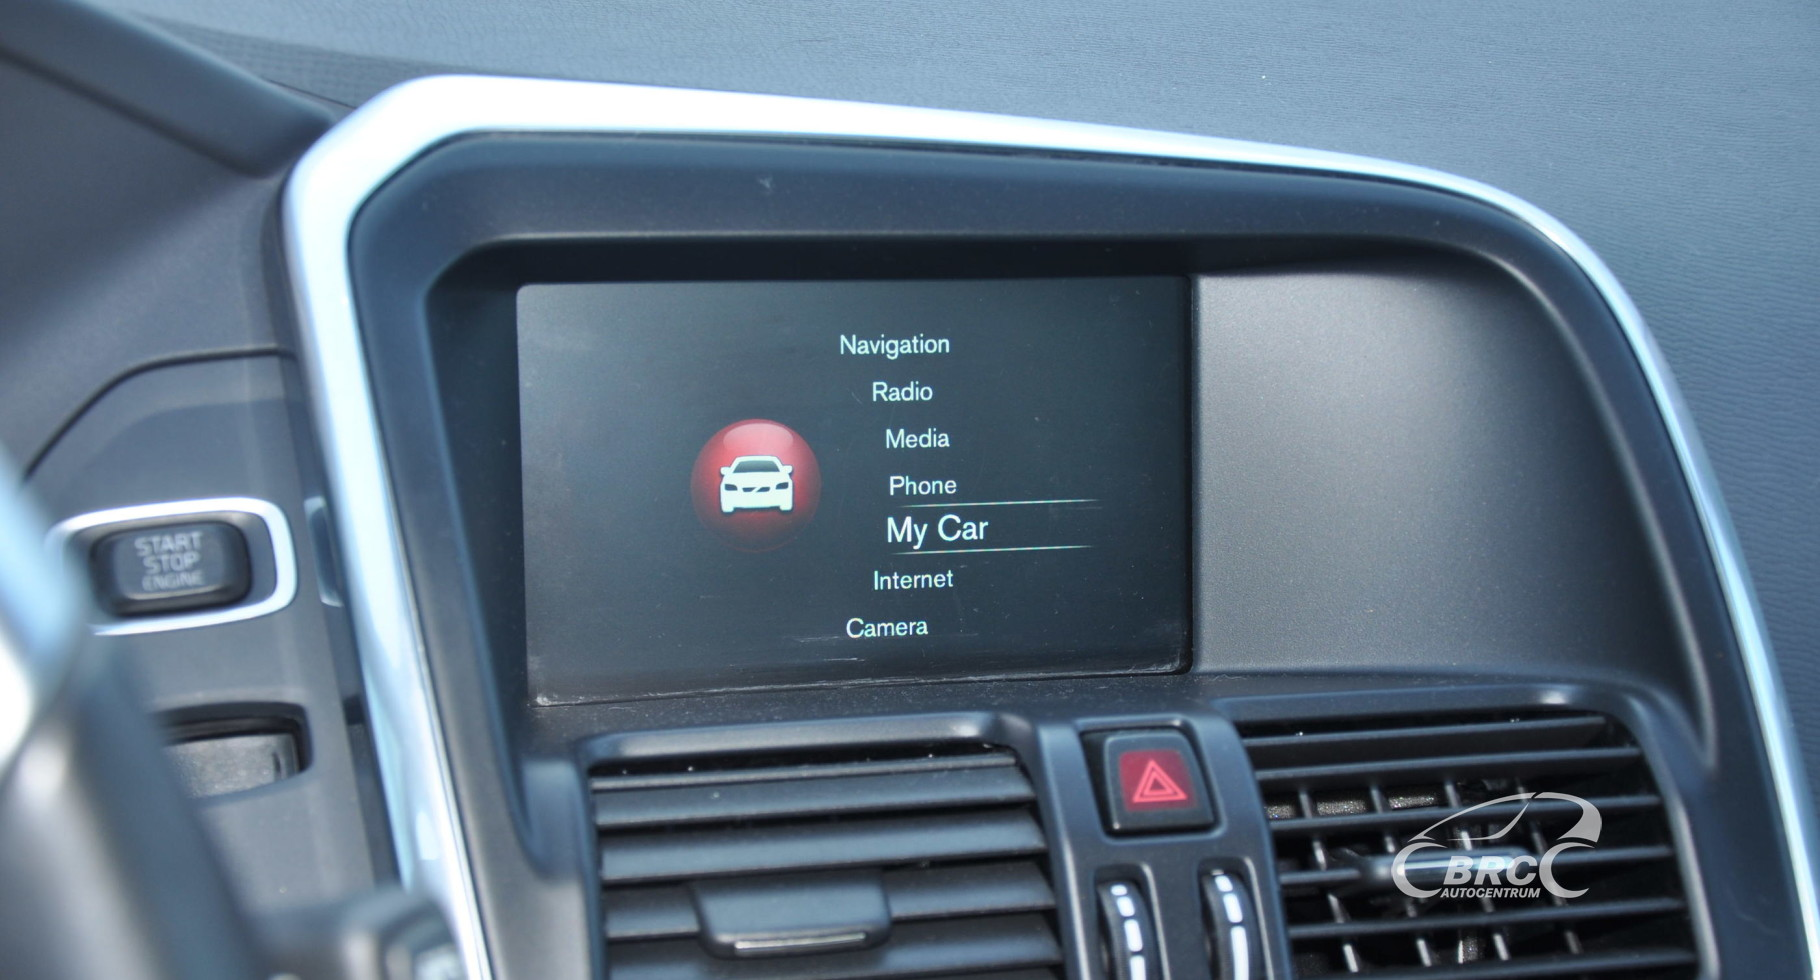 Volvo XC 60 2.0 T5 Automatas